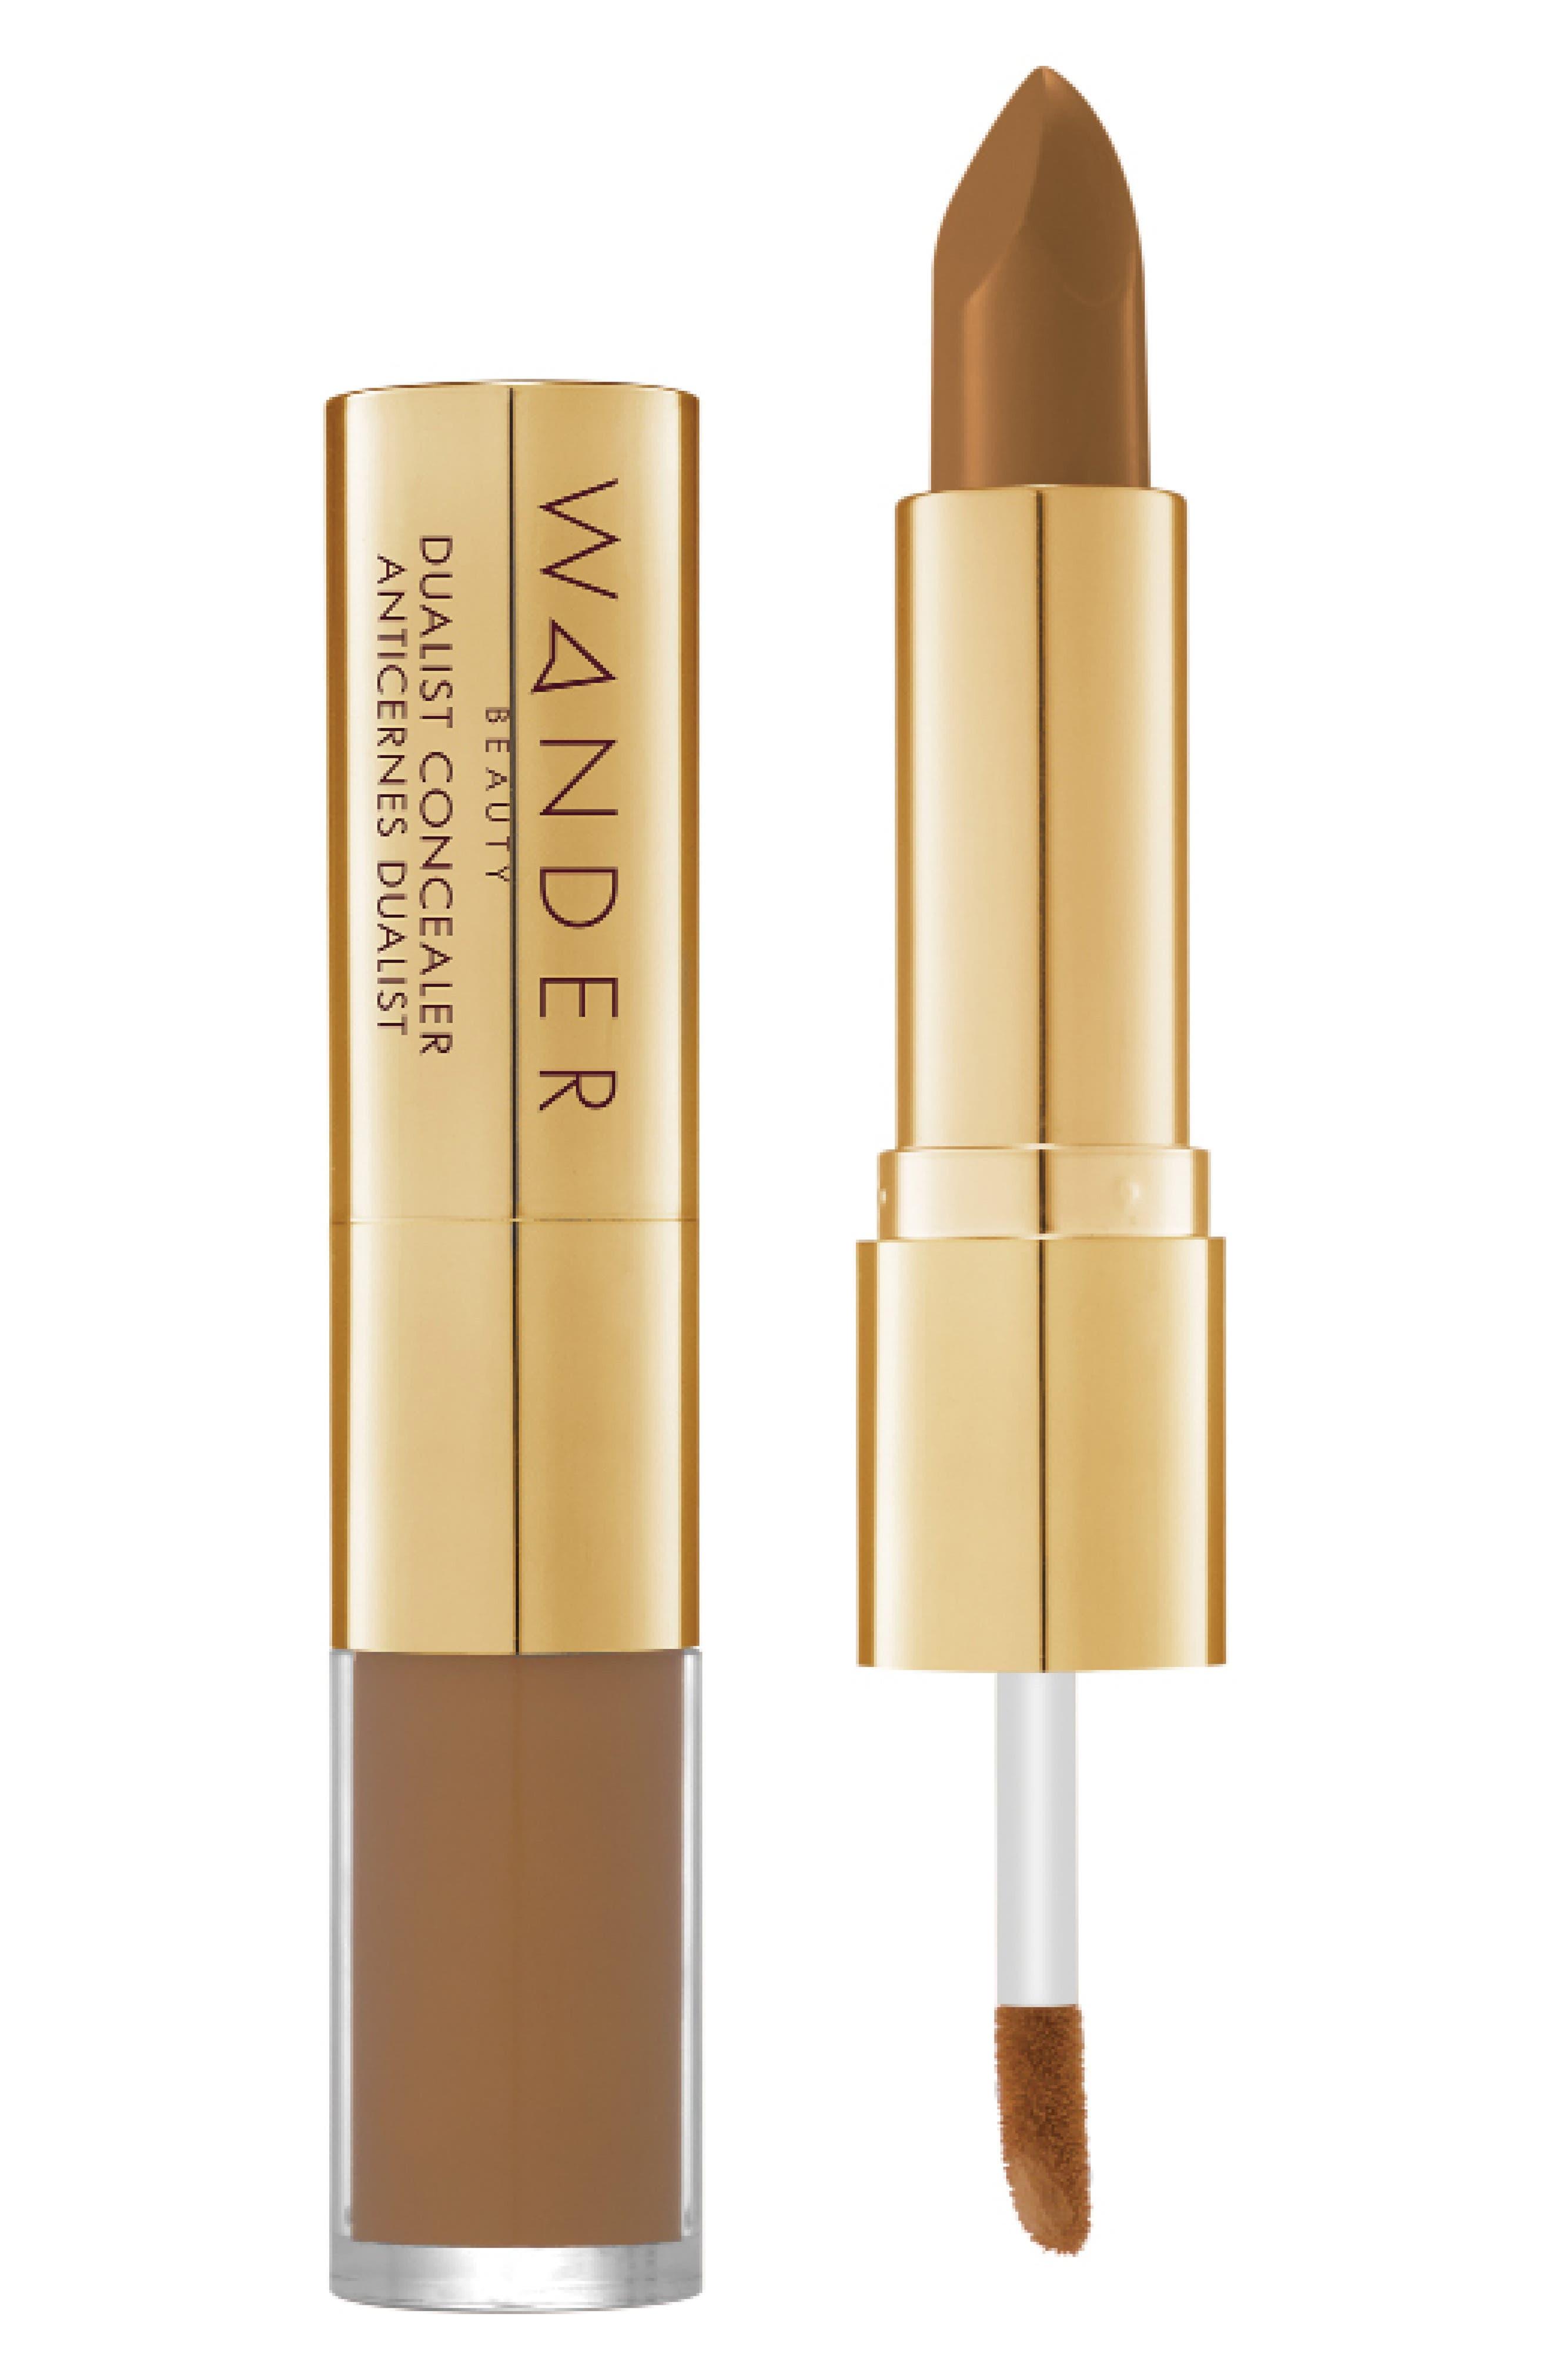 Wander Beauty Dualist Matte & Illuminating Concealer